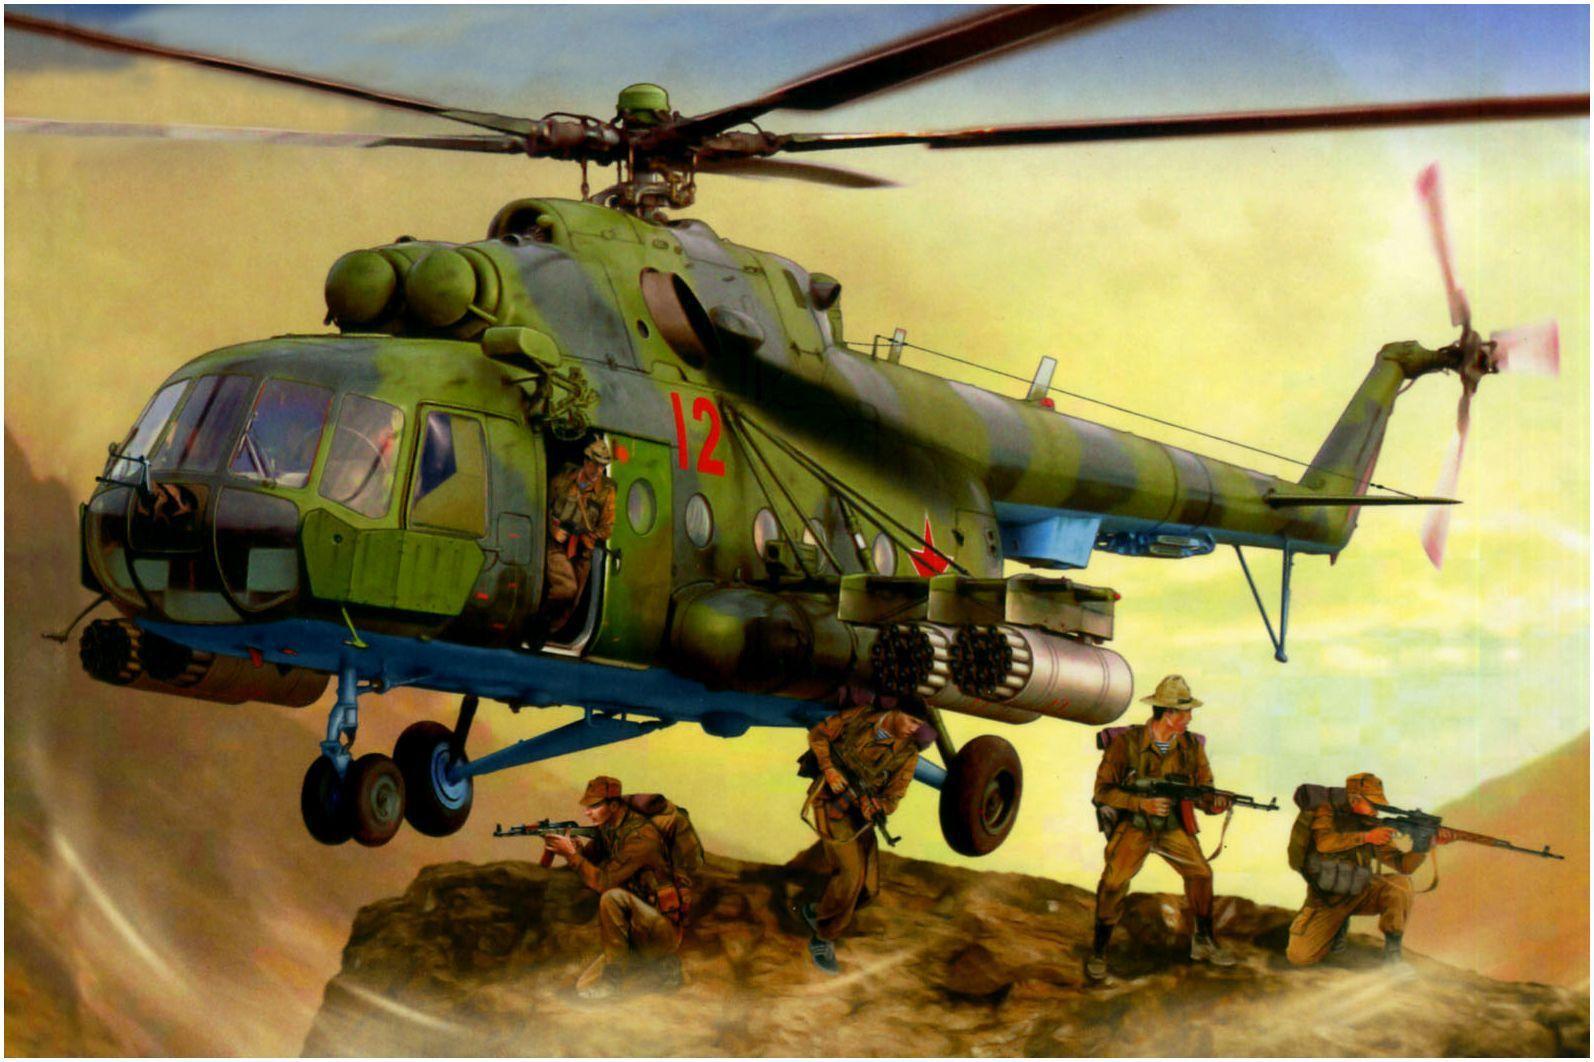 Mil Mi-8 helicopter landing 'Spenaz' in Agfhanistan ...